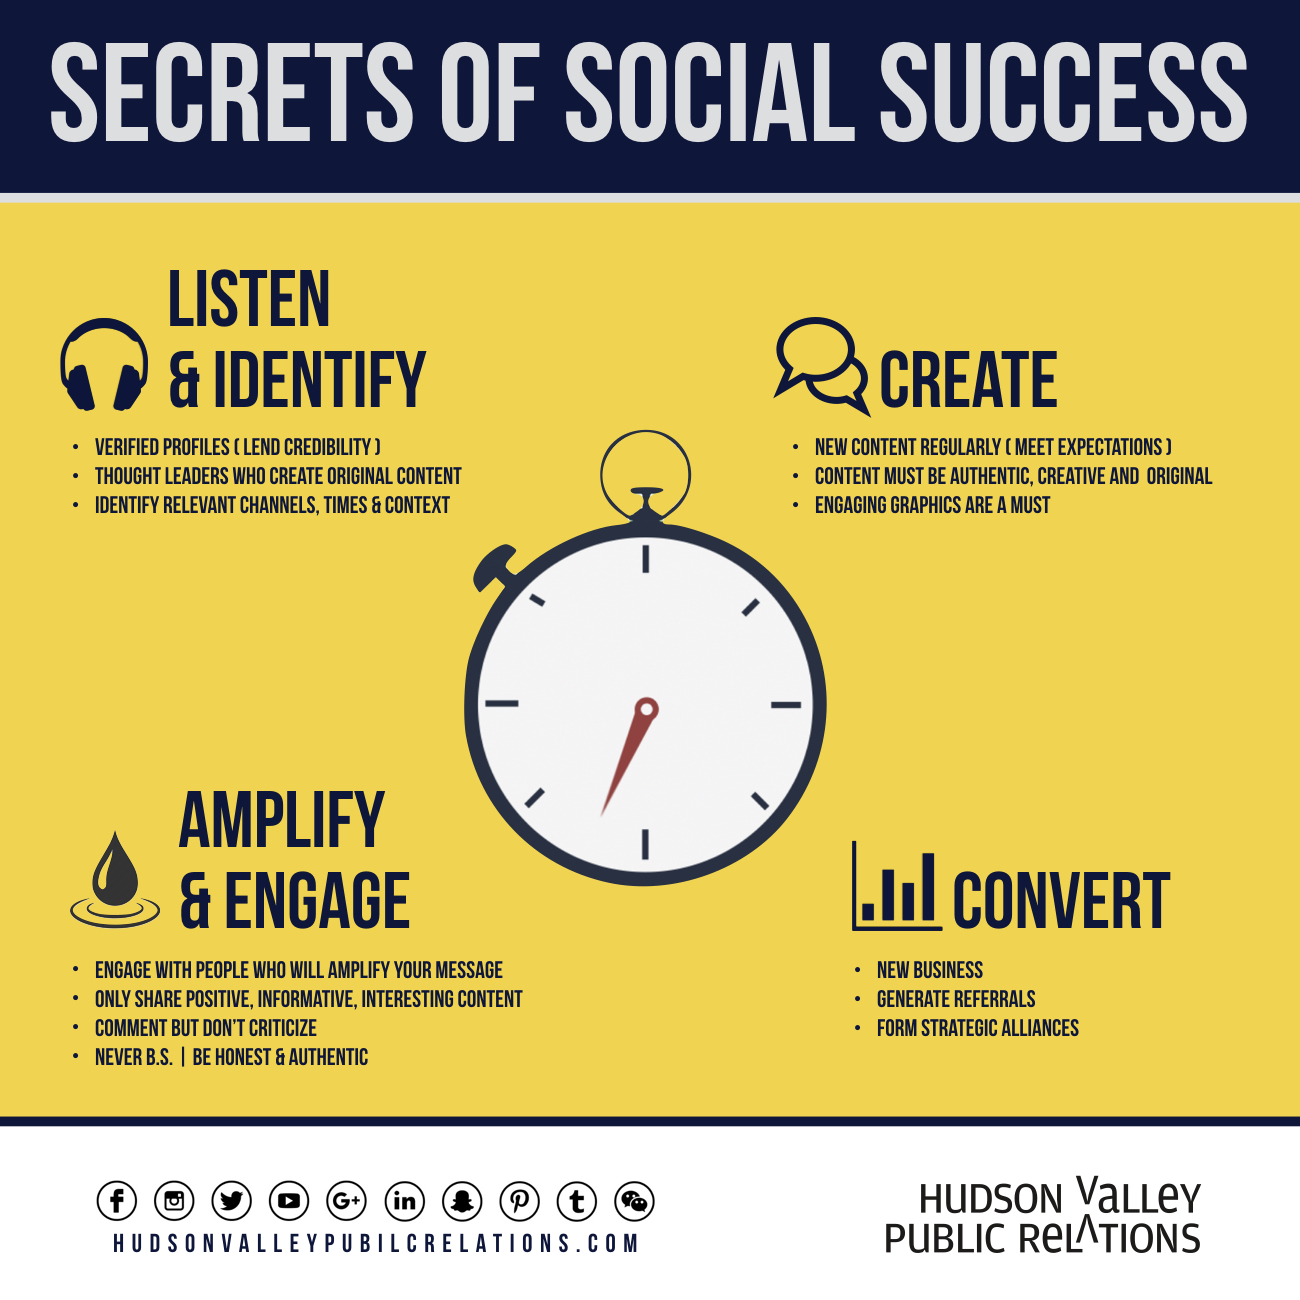 Secrets of Social Success [ Infographic ]